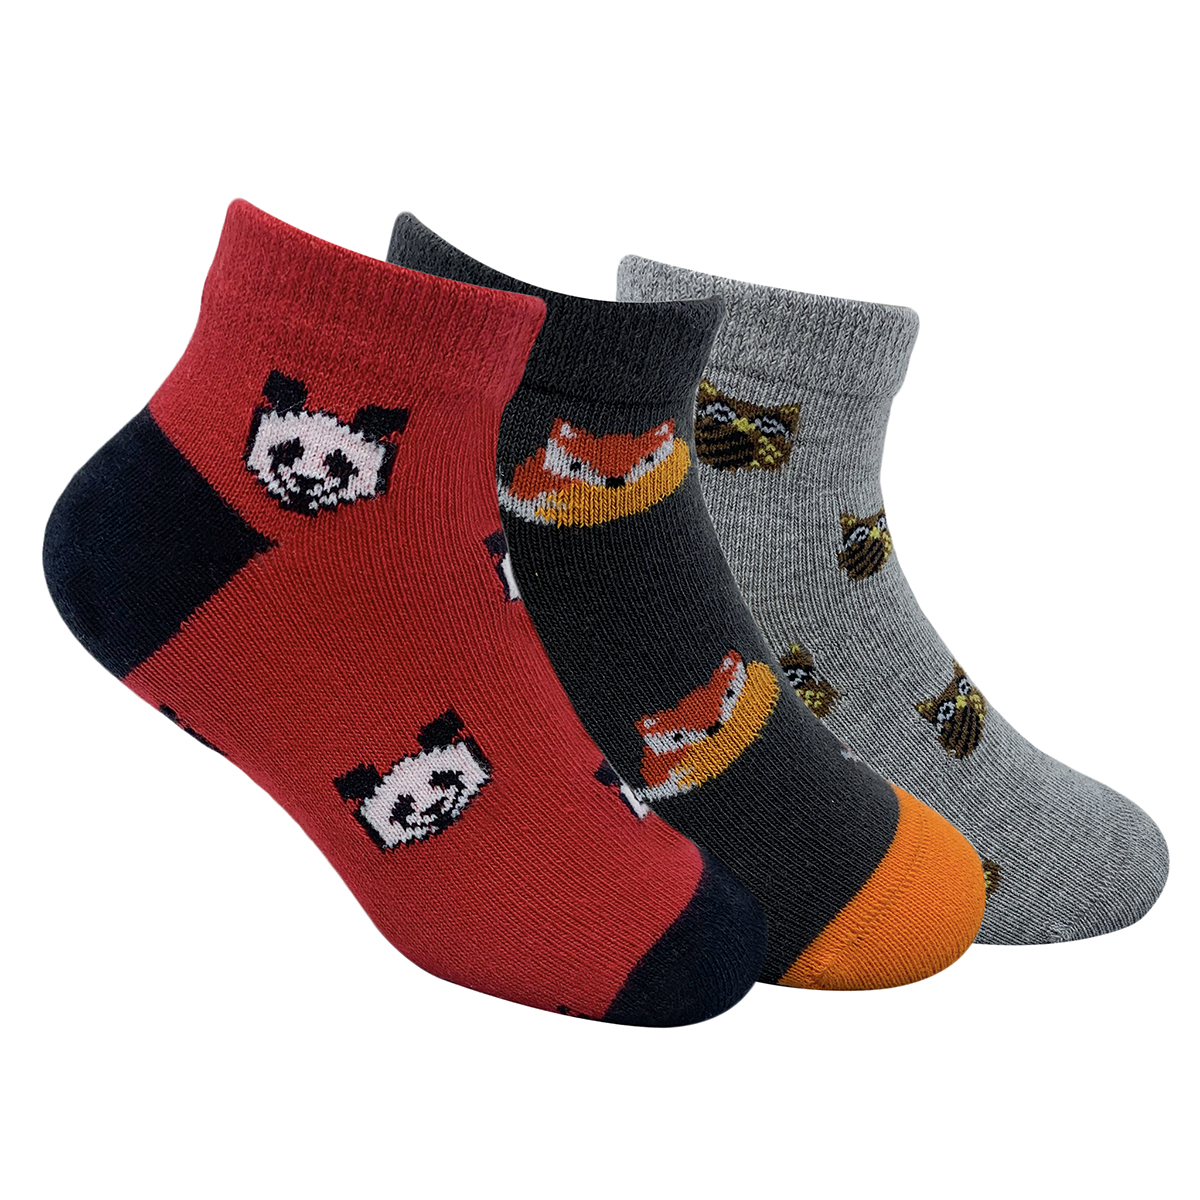 Mint & Oak | Mint & Oak Animal Junction Cotton Ankle Length Socks for Kids